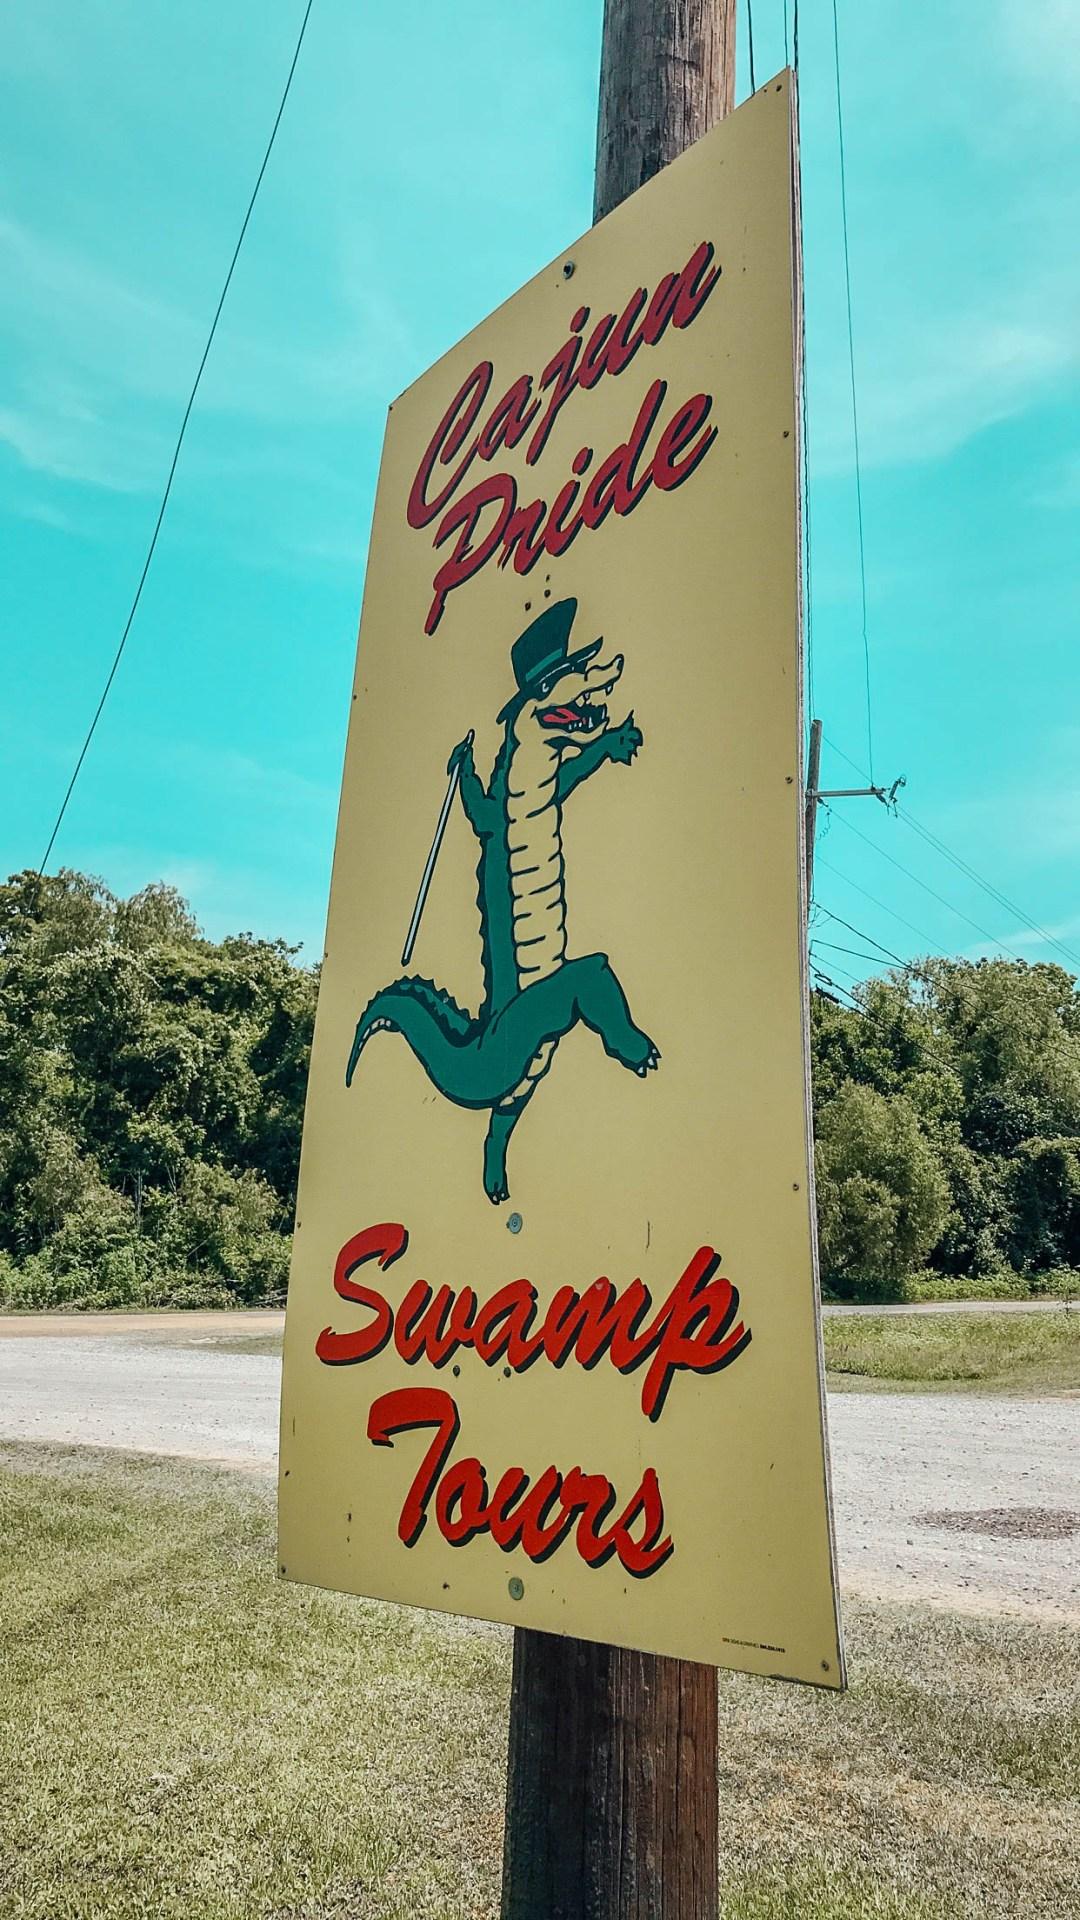 Swamp Tour8